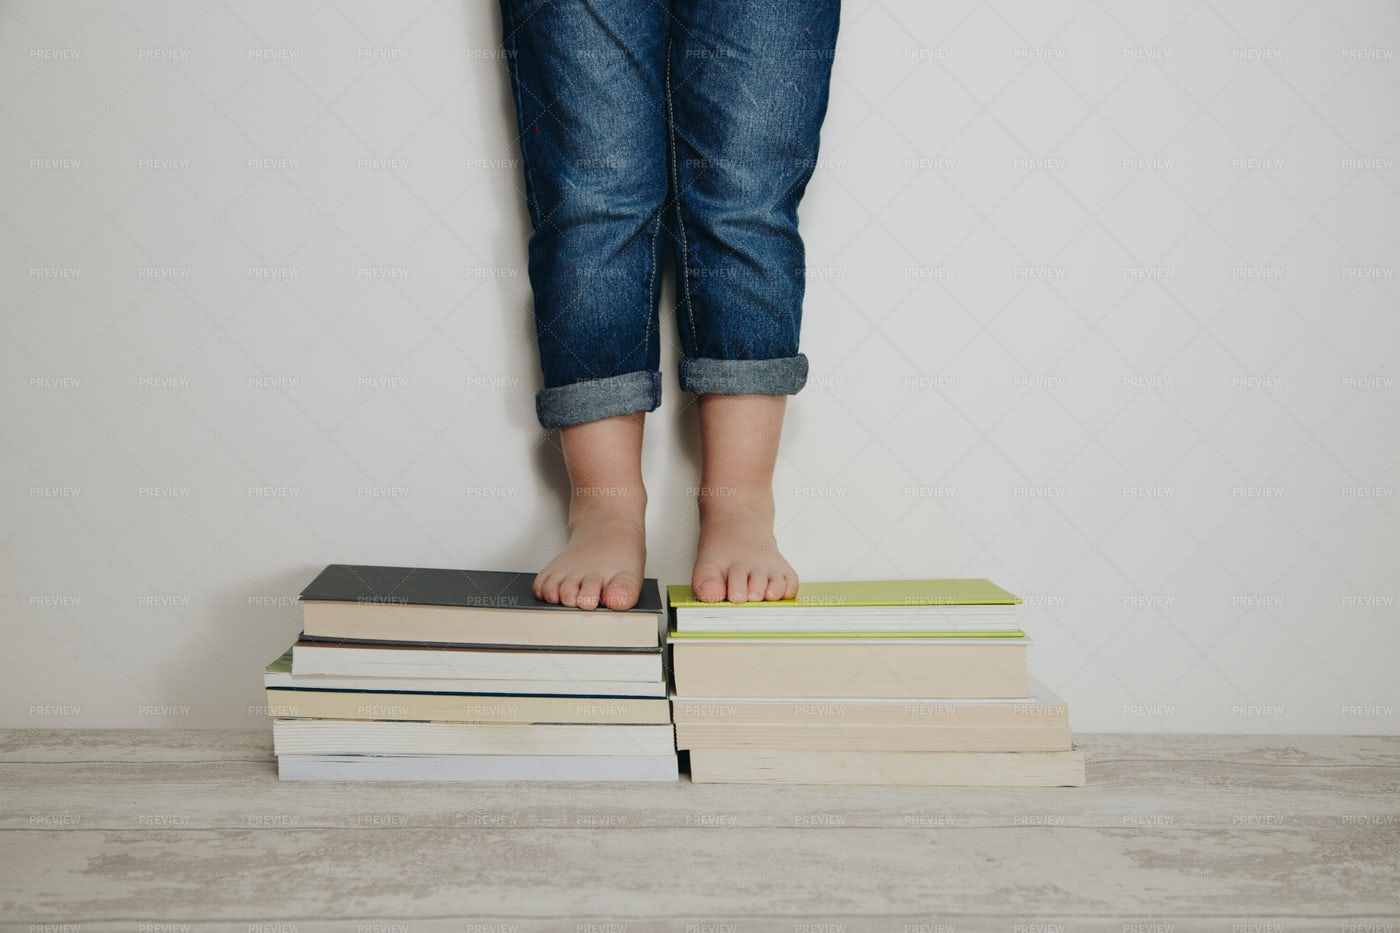 Child Standing On Books: Stock Photos